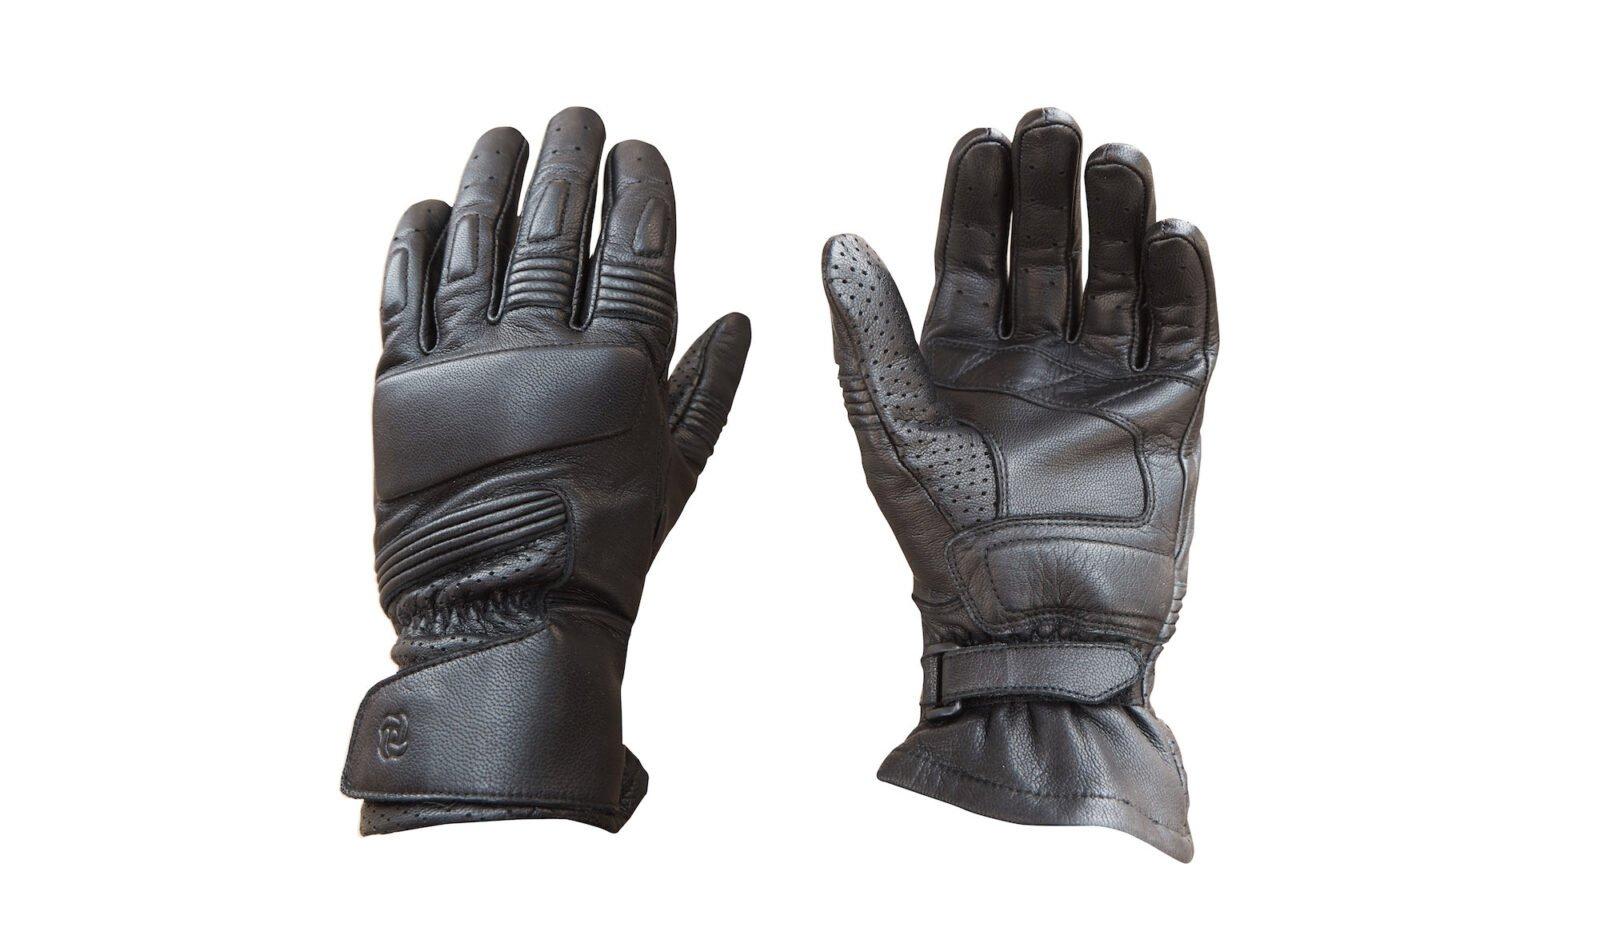 Pagnol M4 Moto Gloves 1600x927 - Pagnol M4 Moto Gloves